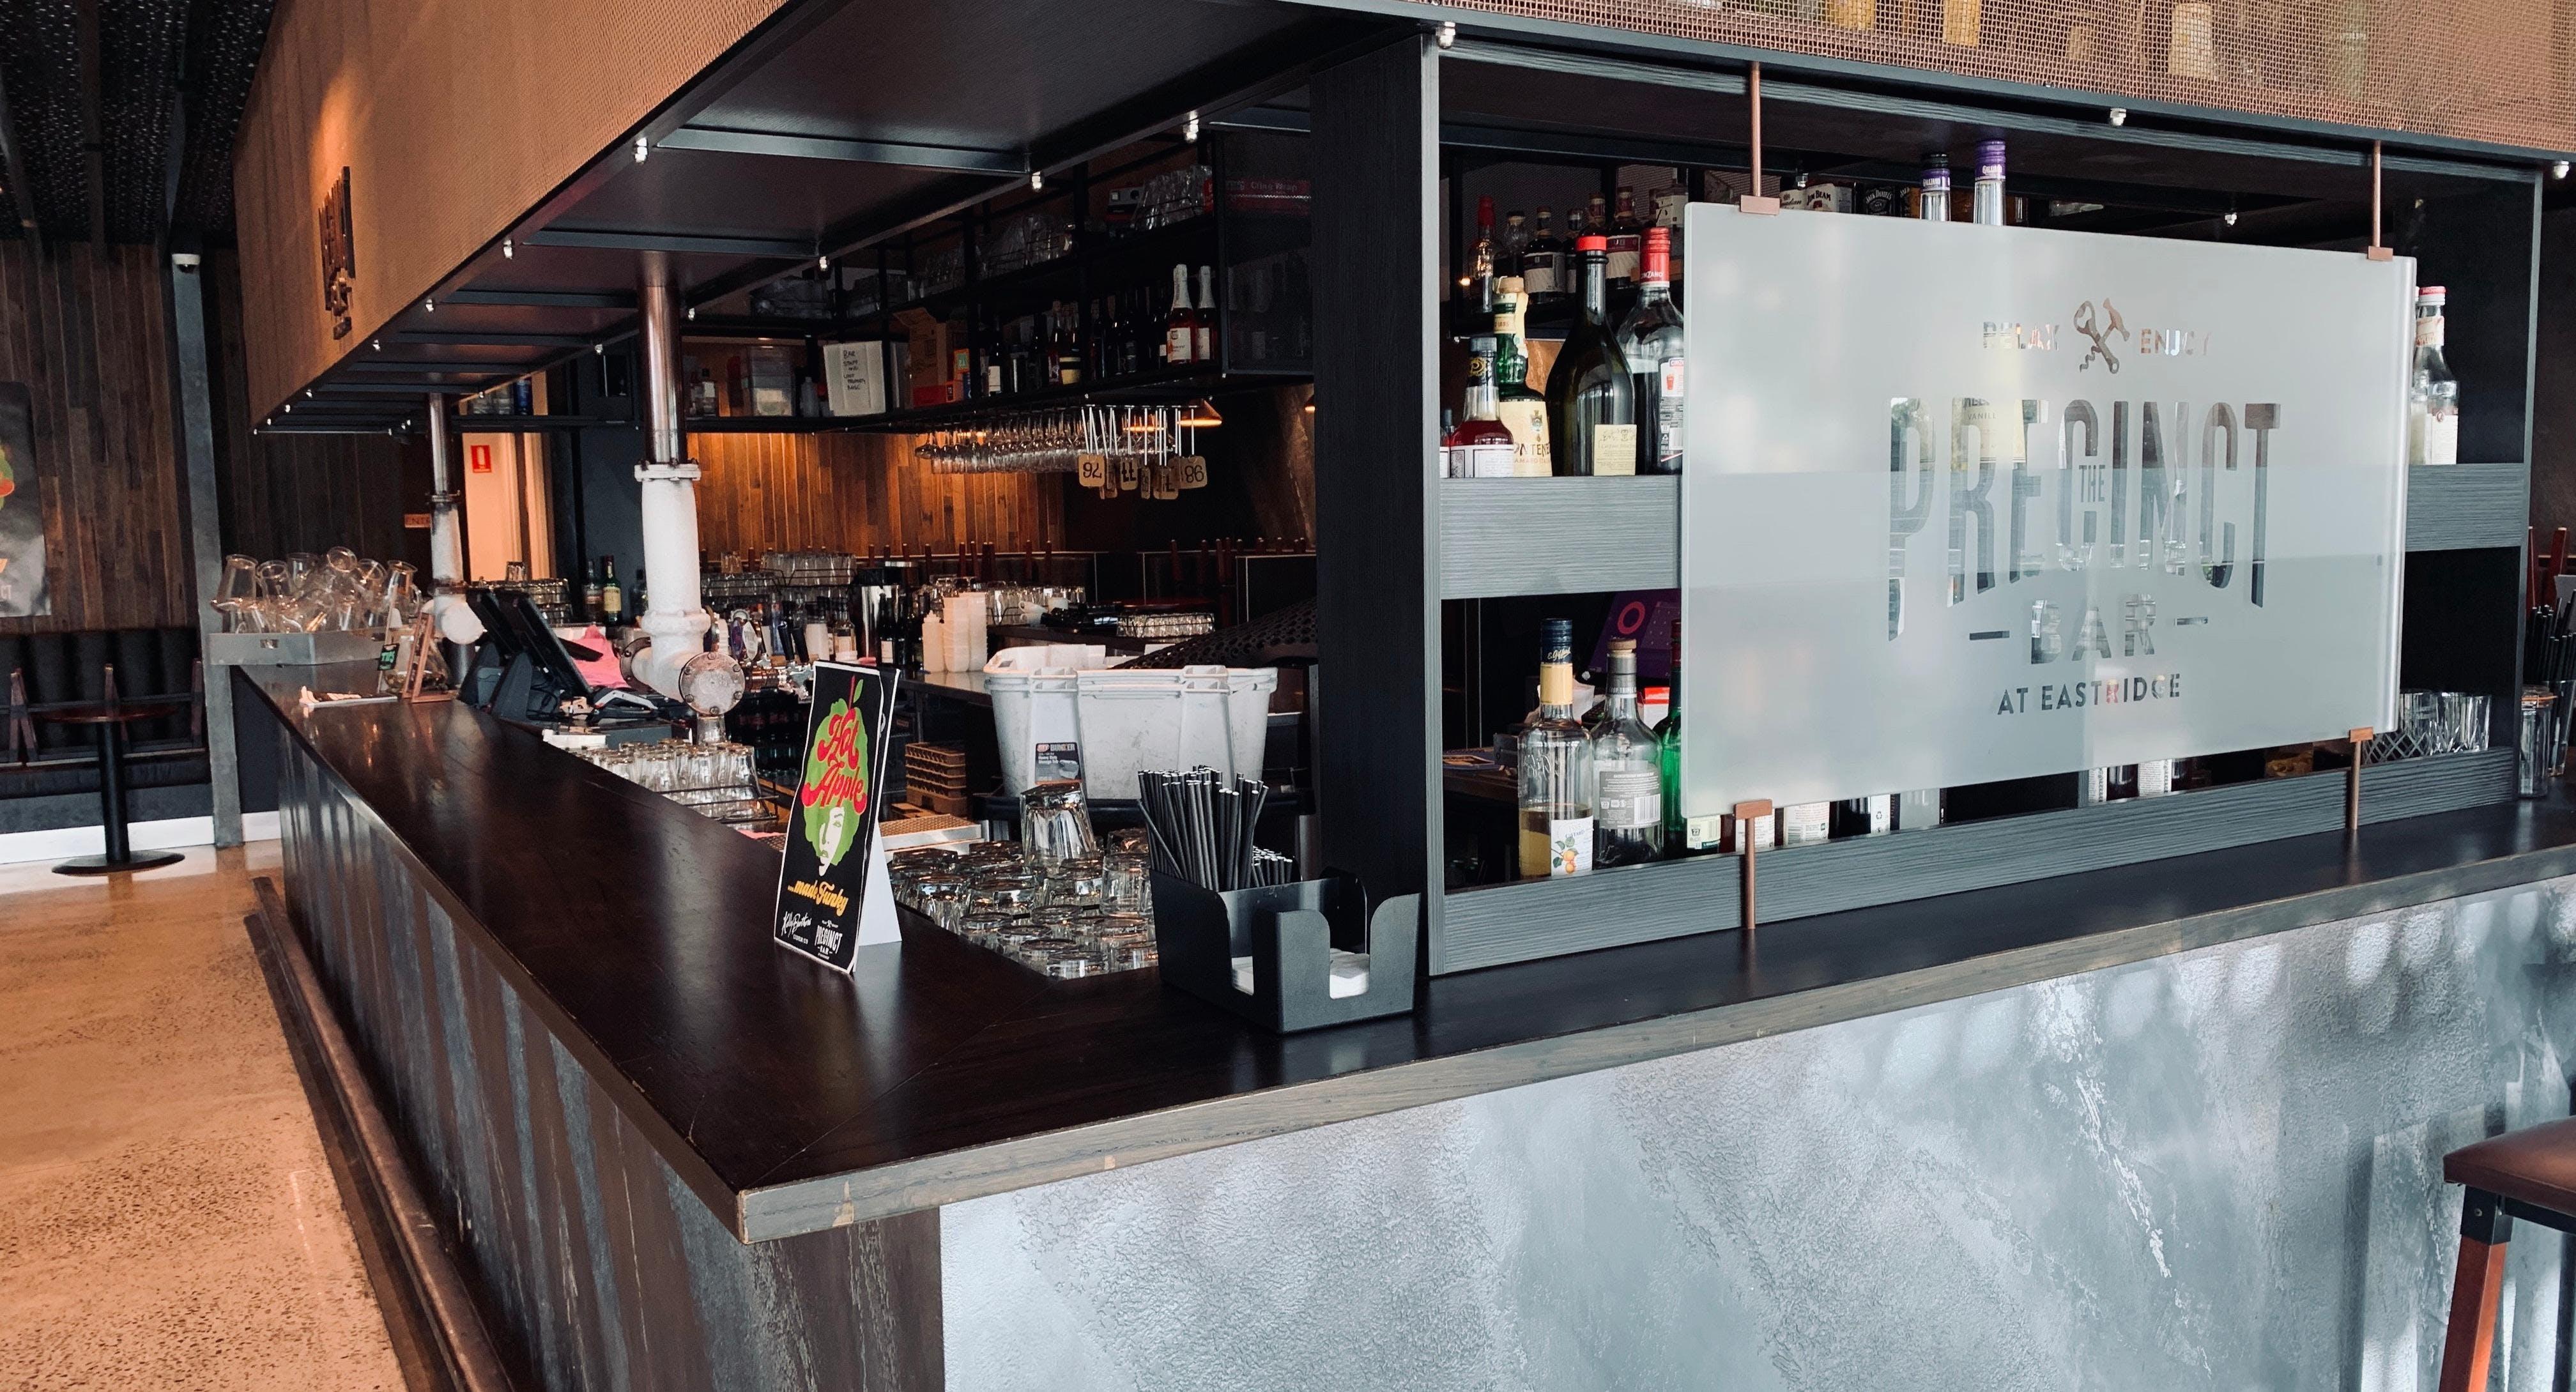 The Precinct Bar @ Eastridge